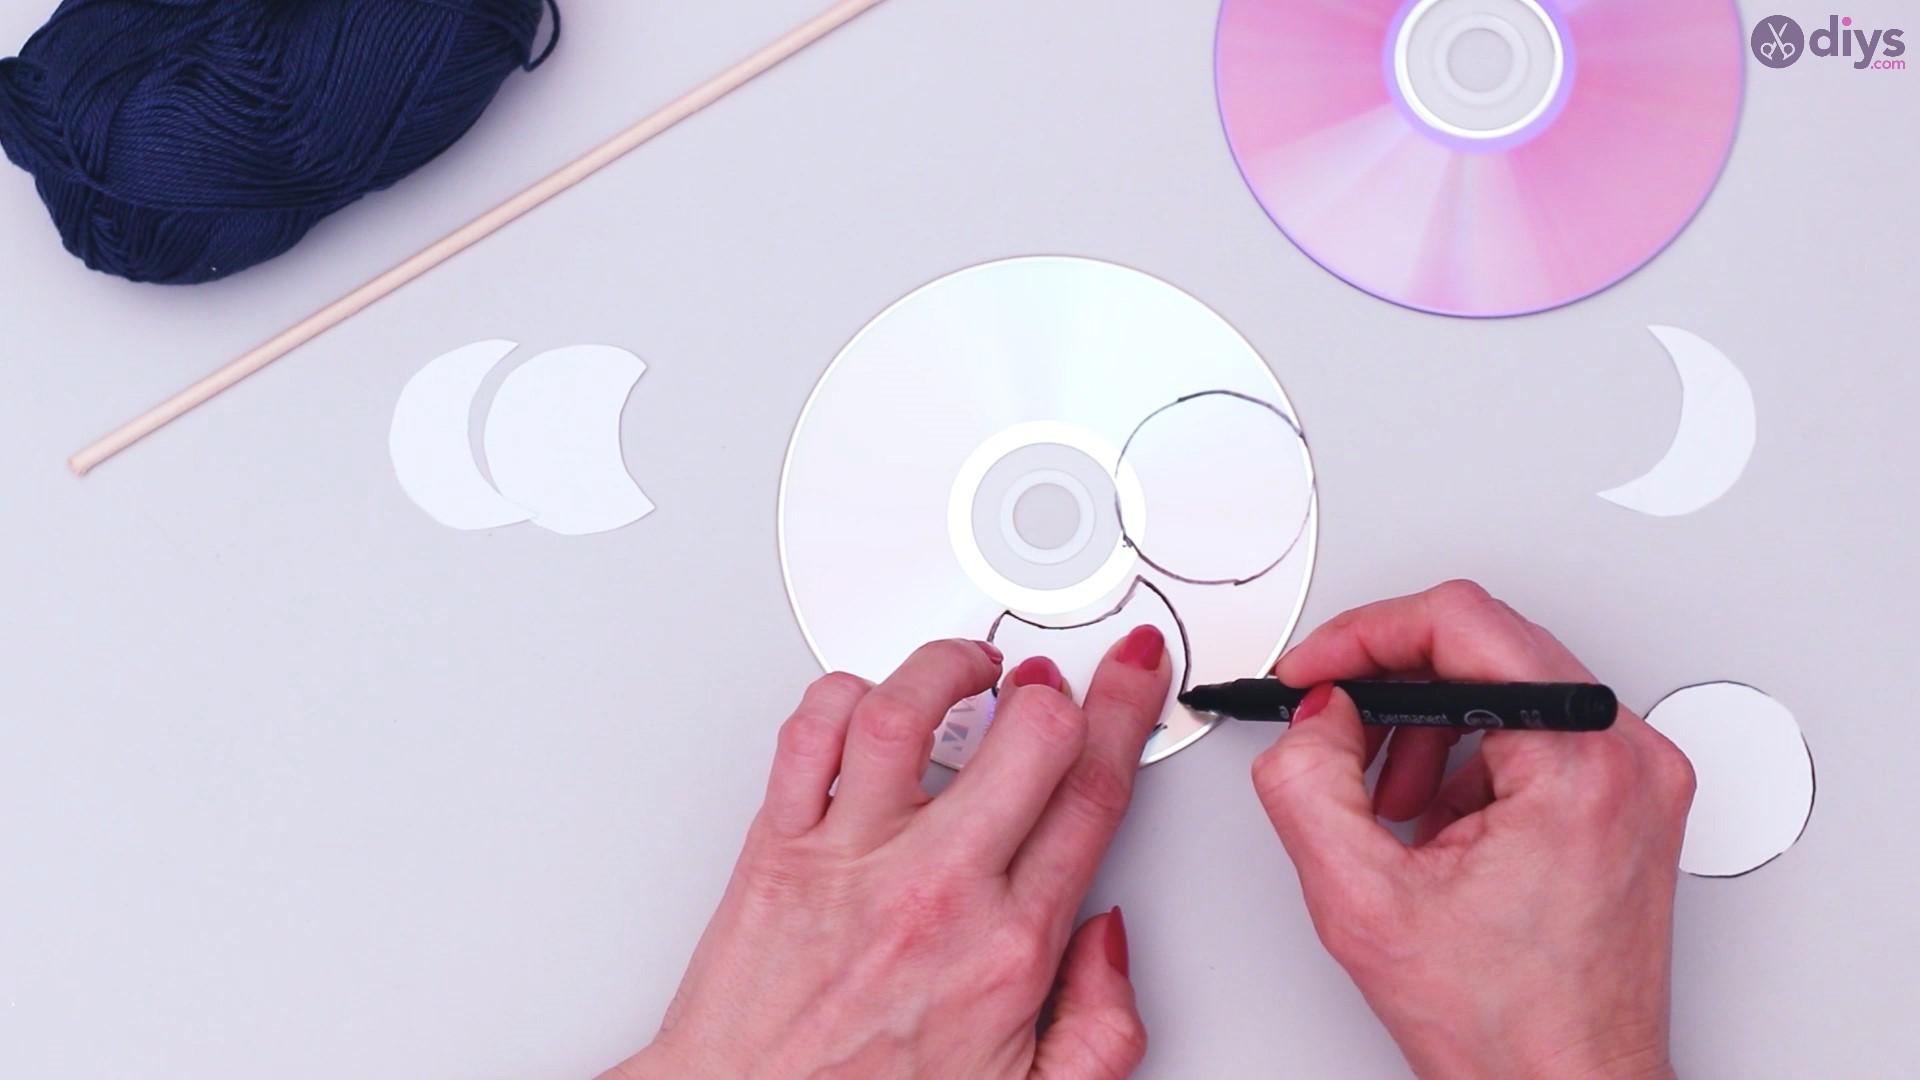 Lunar eclipse cd wall hanging (4)